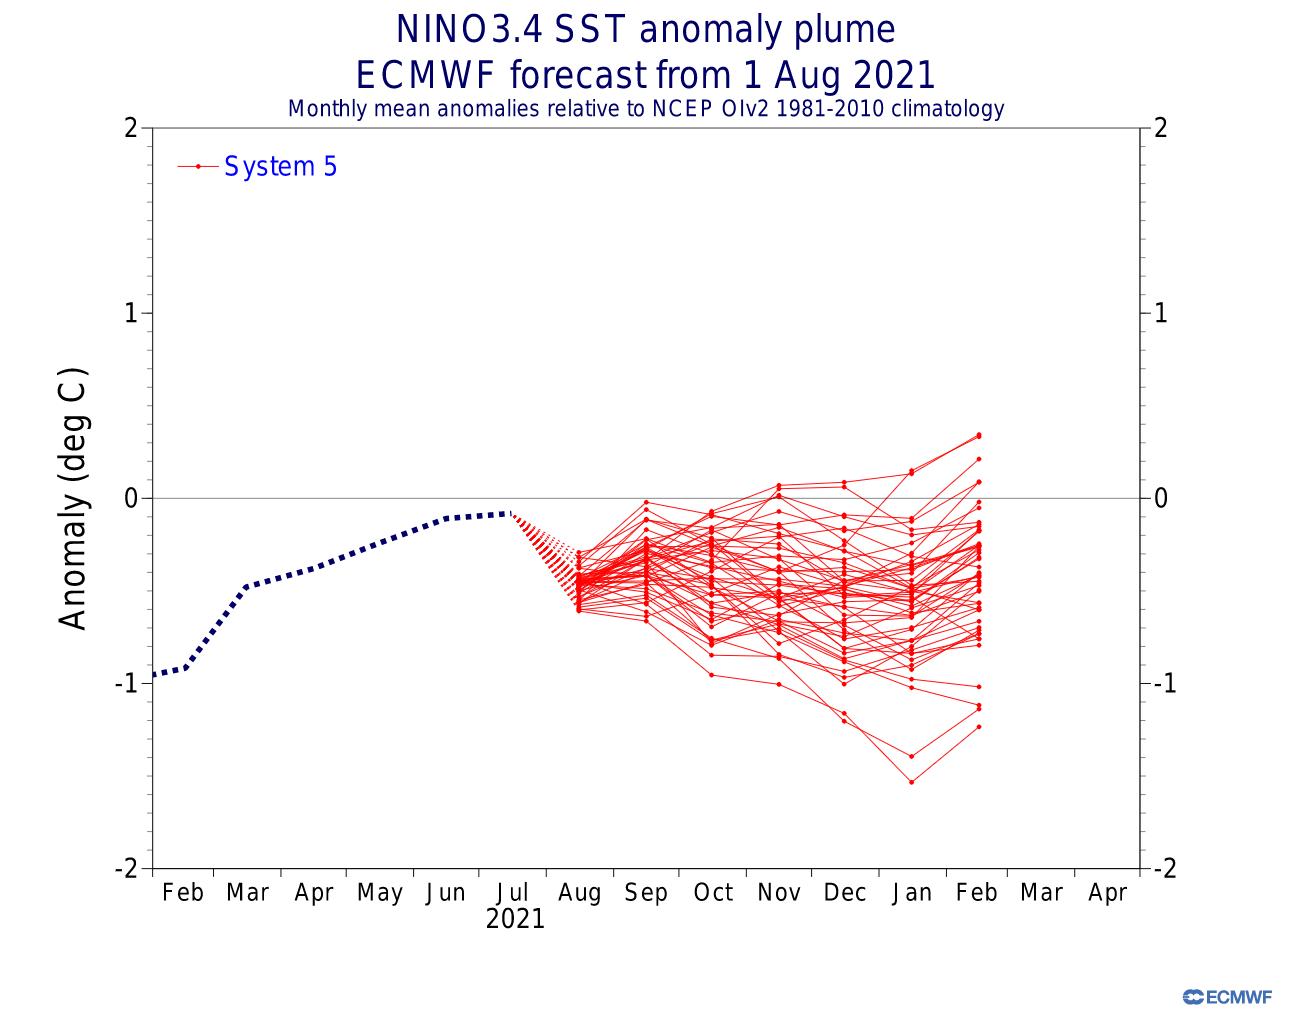 fall-winter-forecast-enso-region-temperature-anomaly